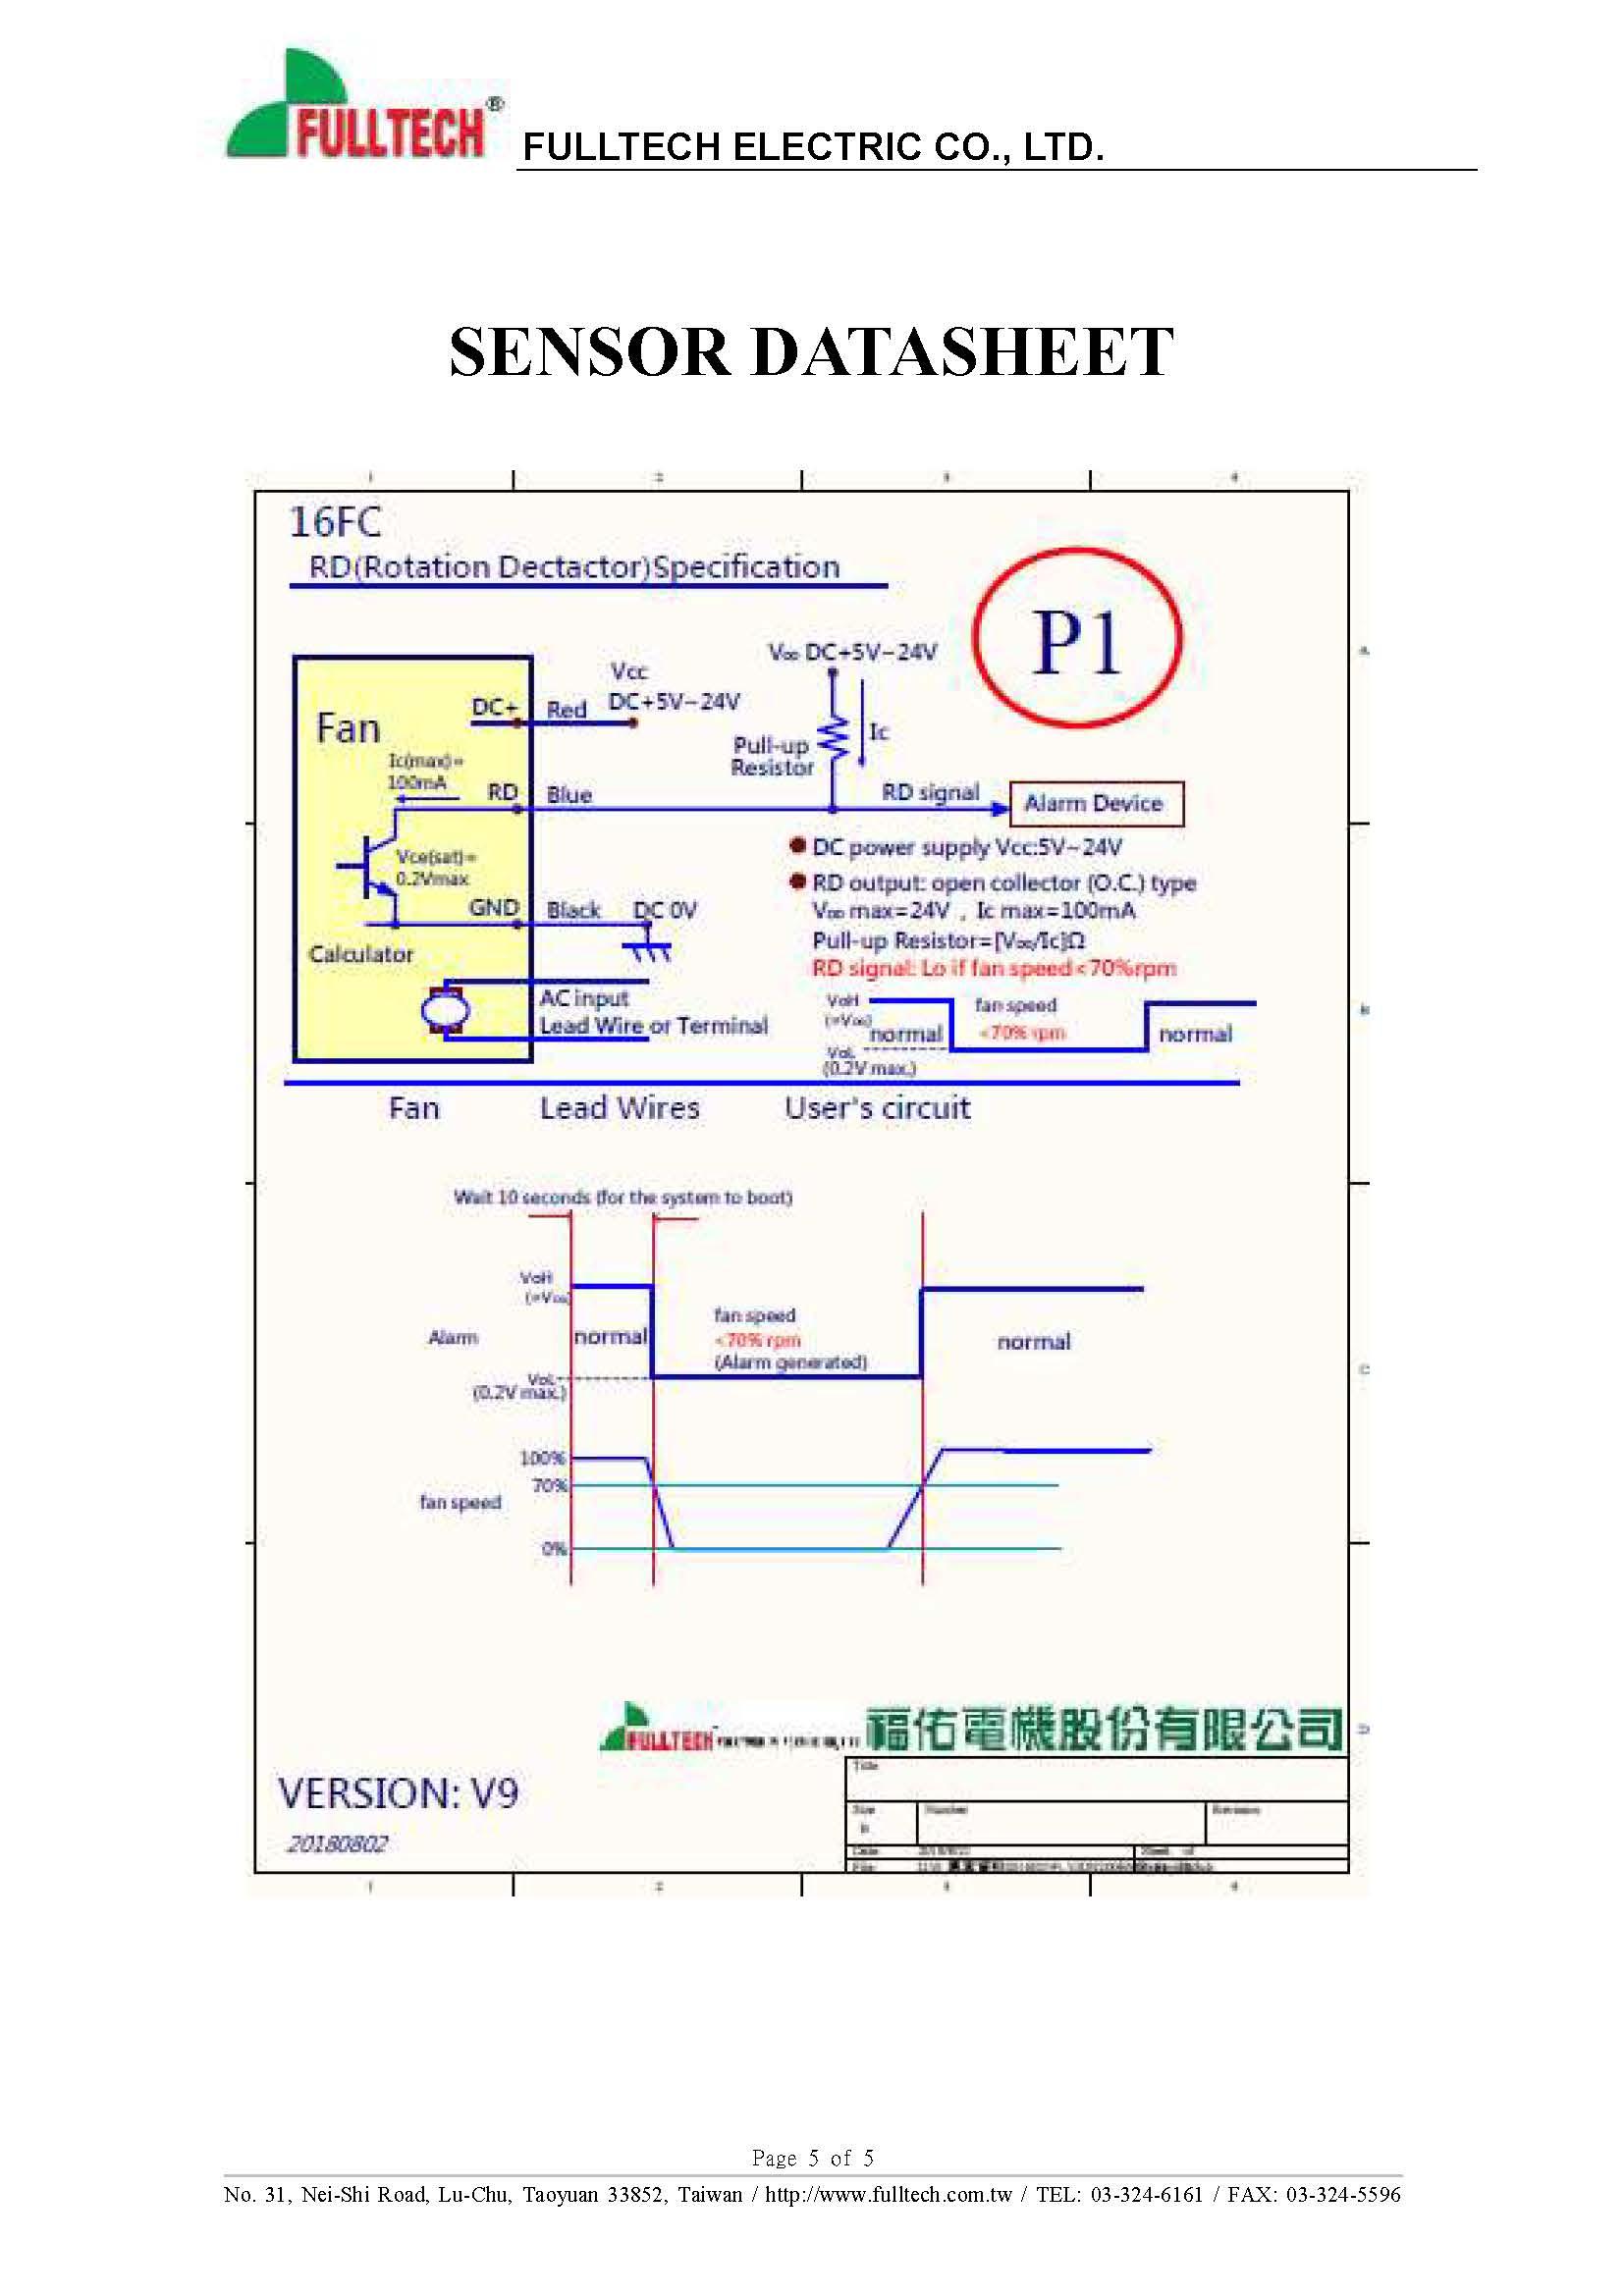 UF16FC23BTH-P1 Data sheet_페이지_5.jpg